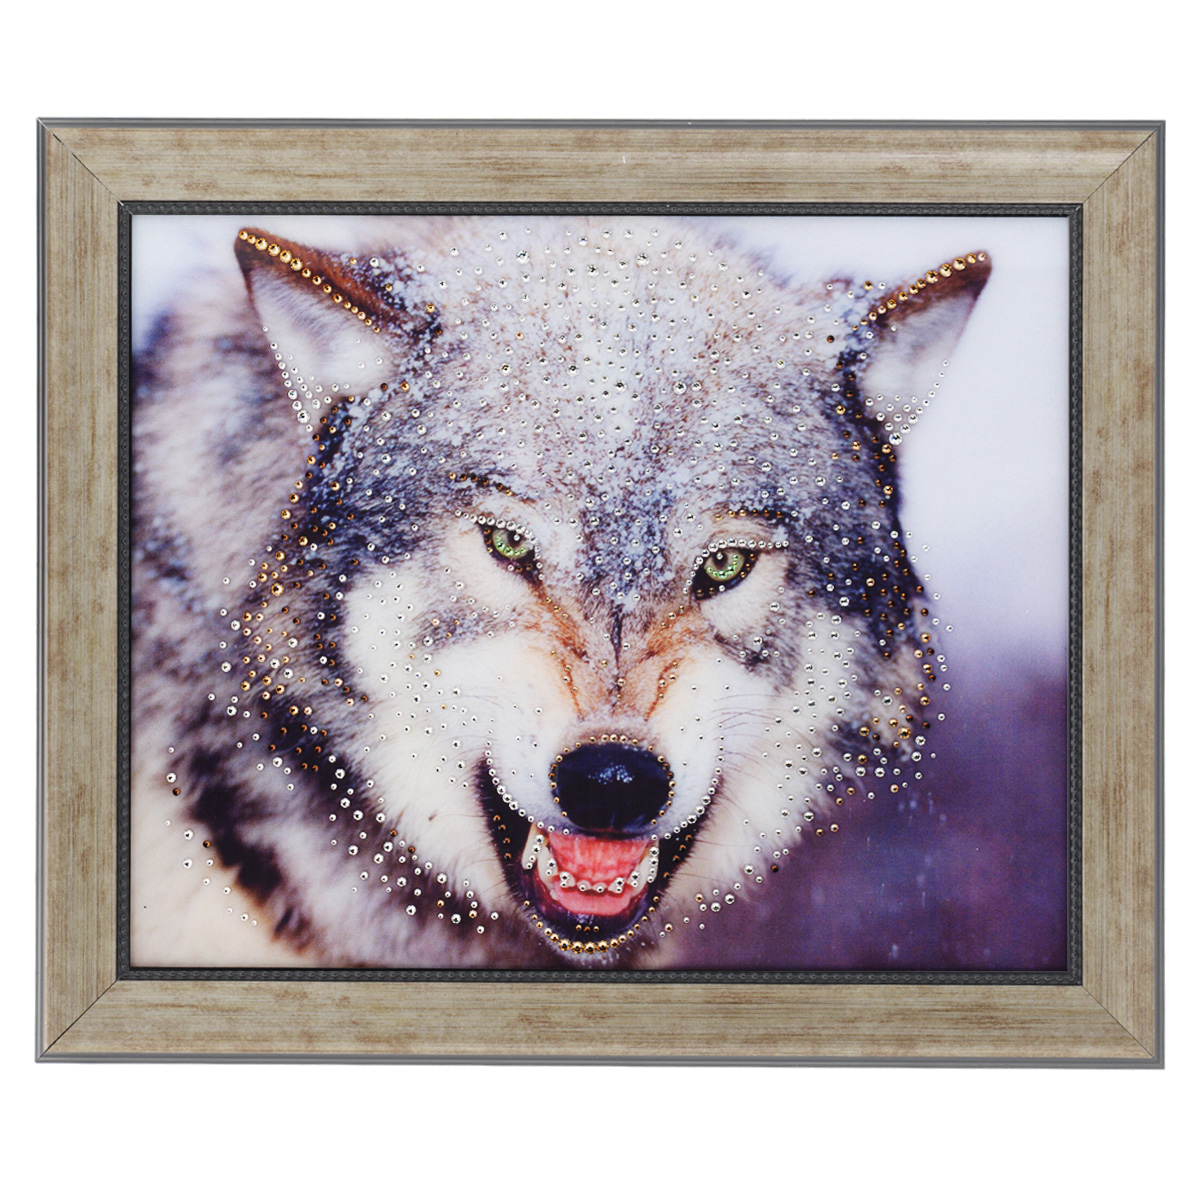 Картина с кристаллами Swarovski Волк, 60 х 50 см картины в квартиру картина etude 2 102х130 см